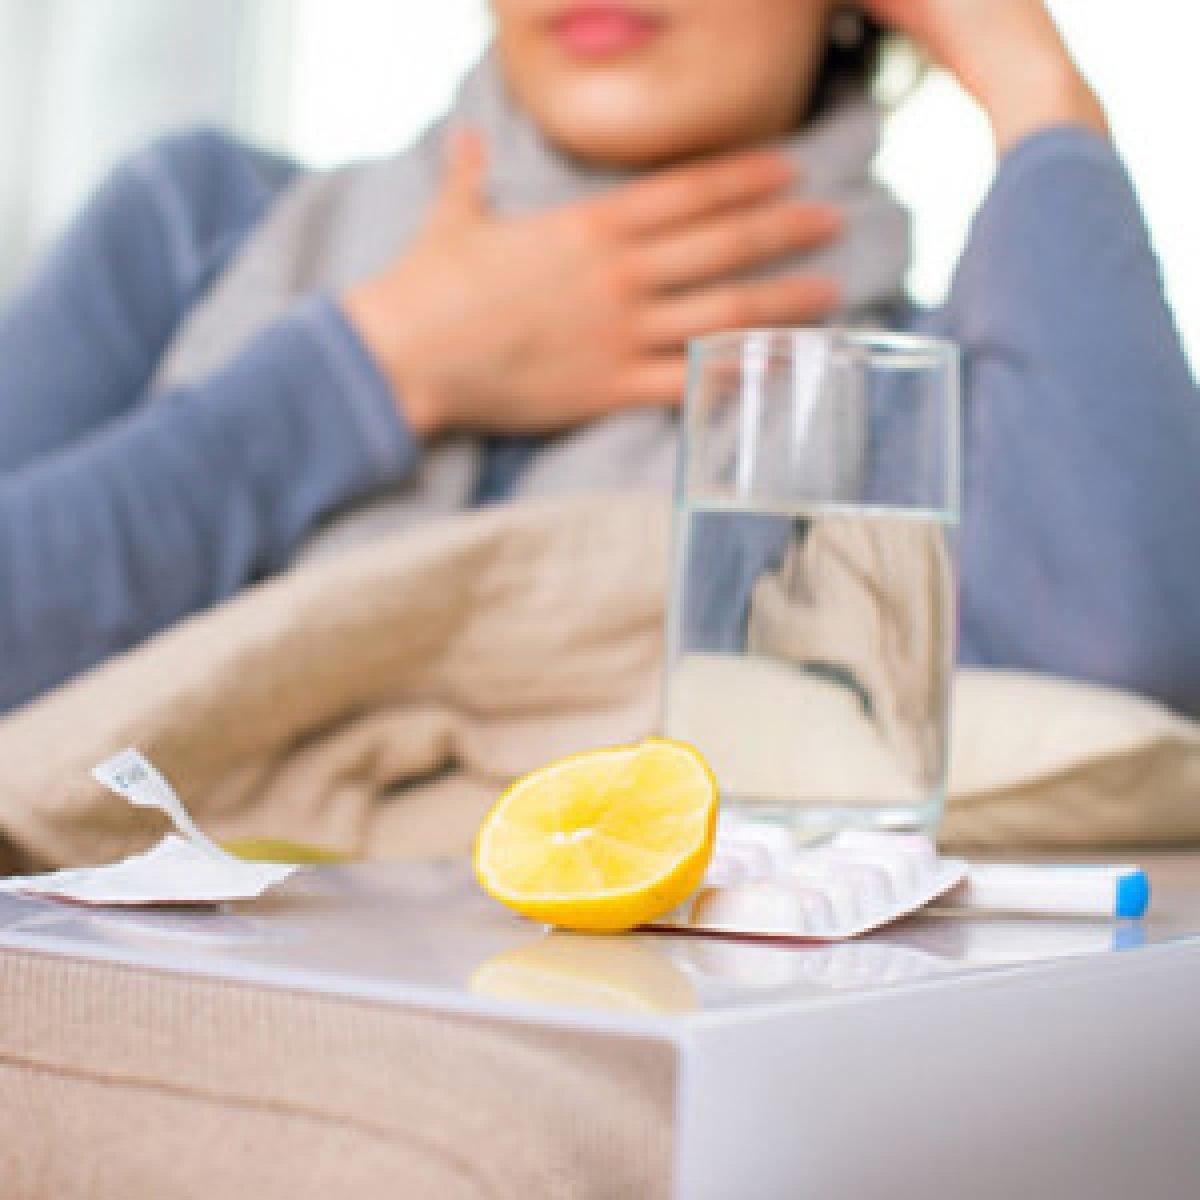 Is Bronchitis Contagious?